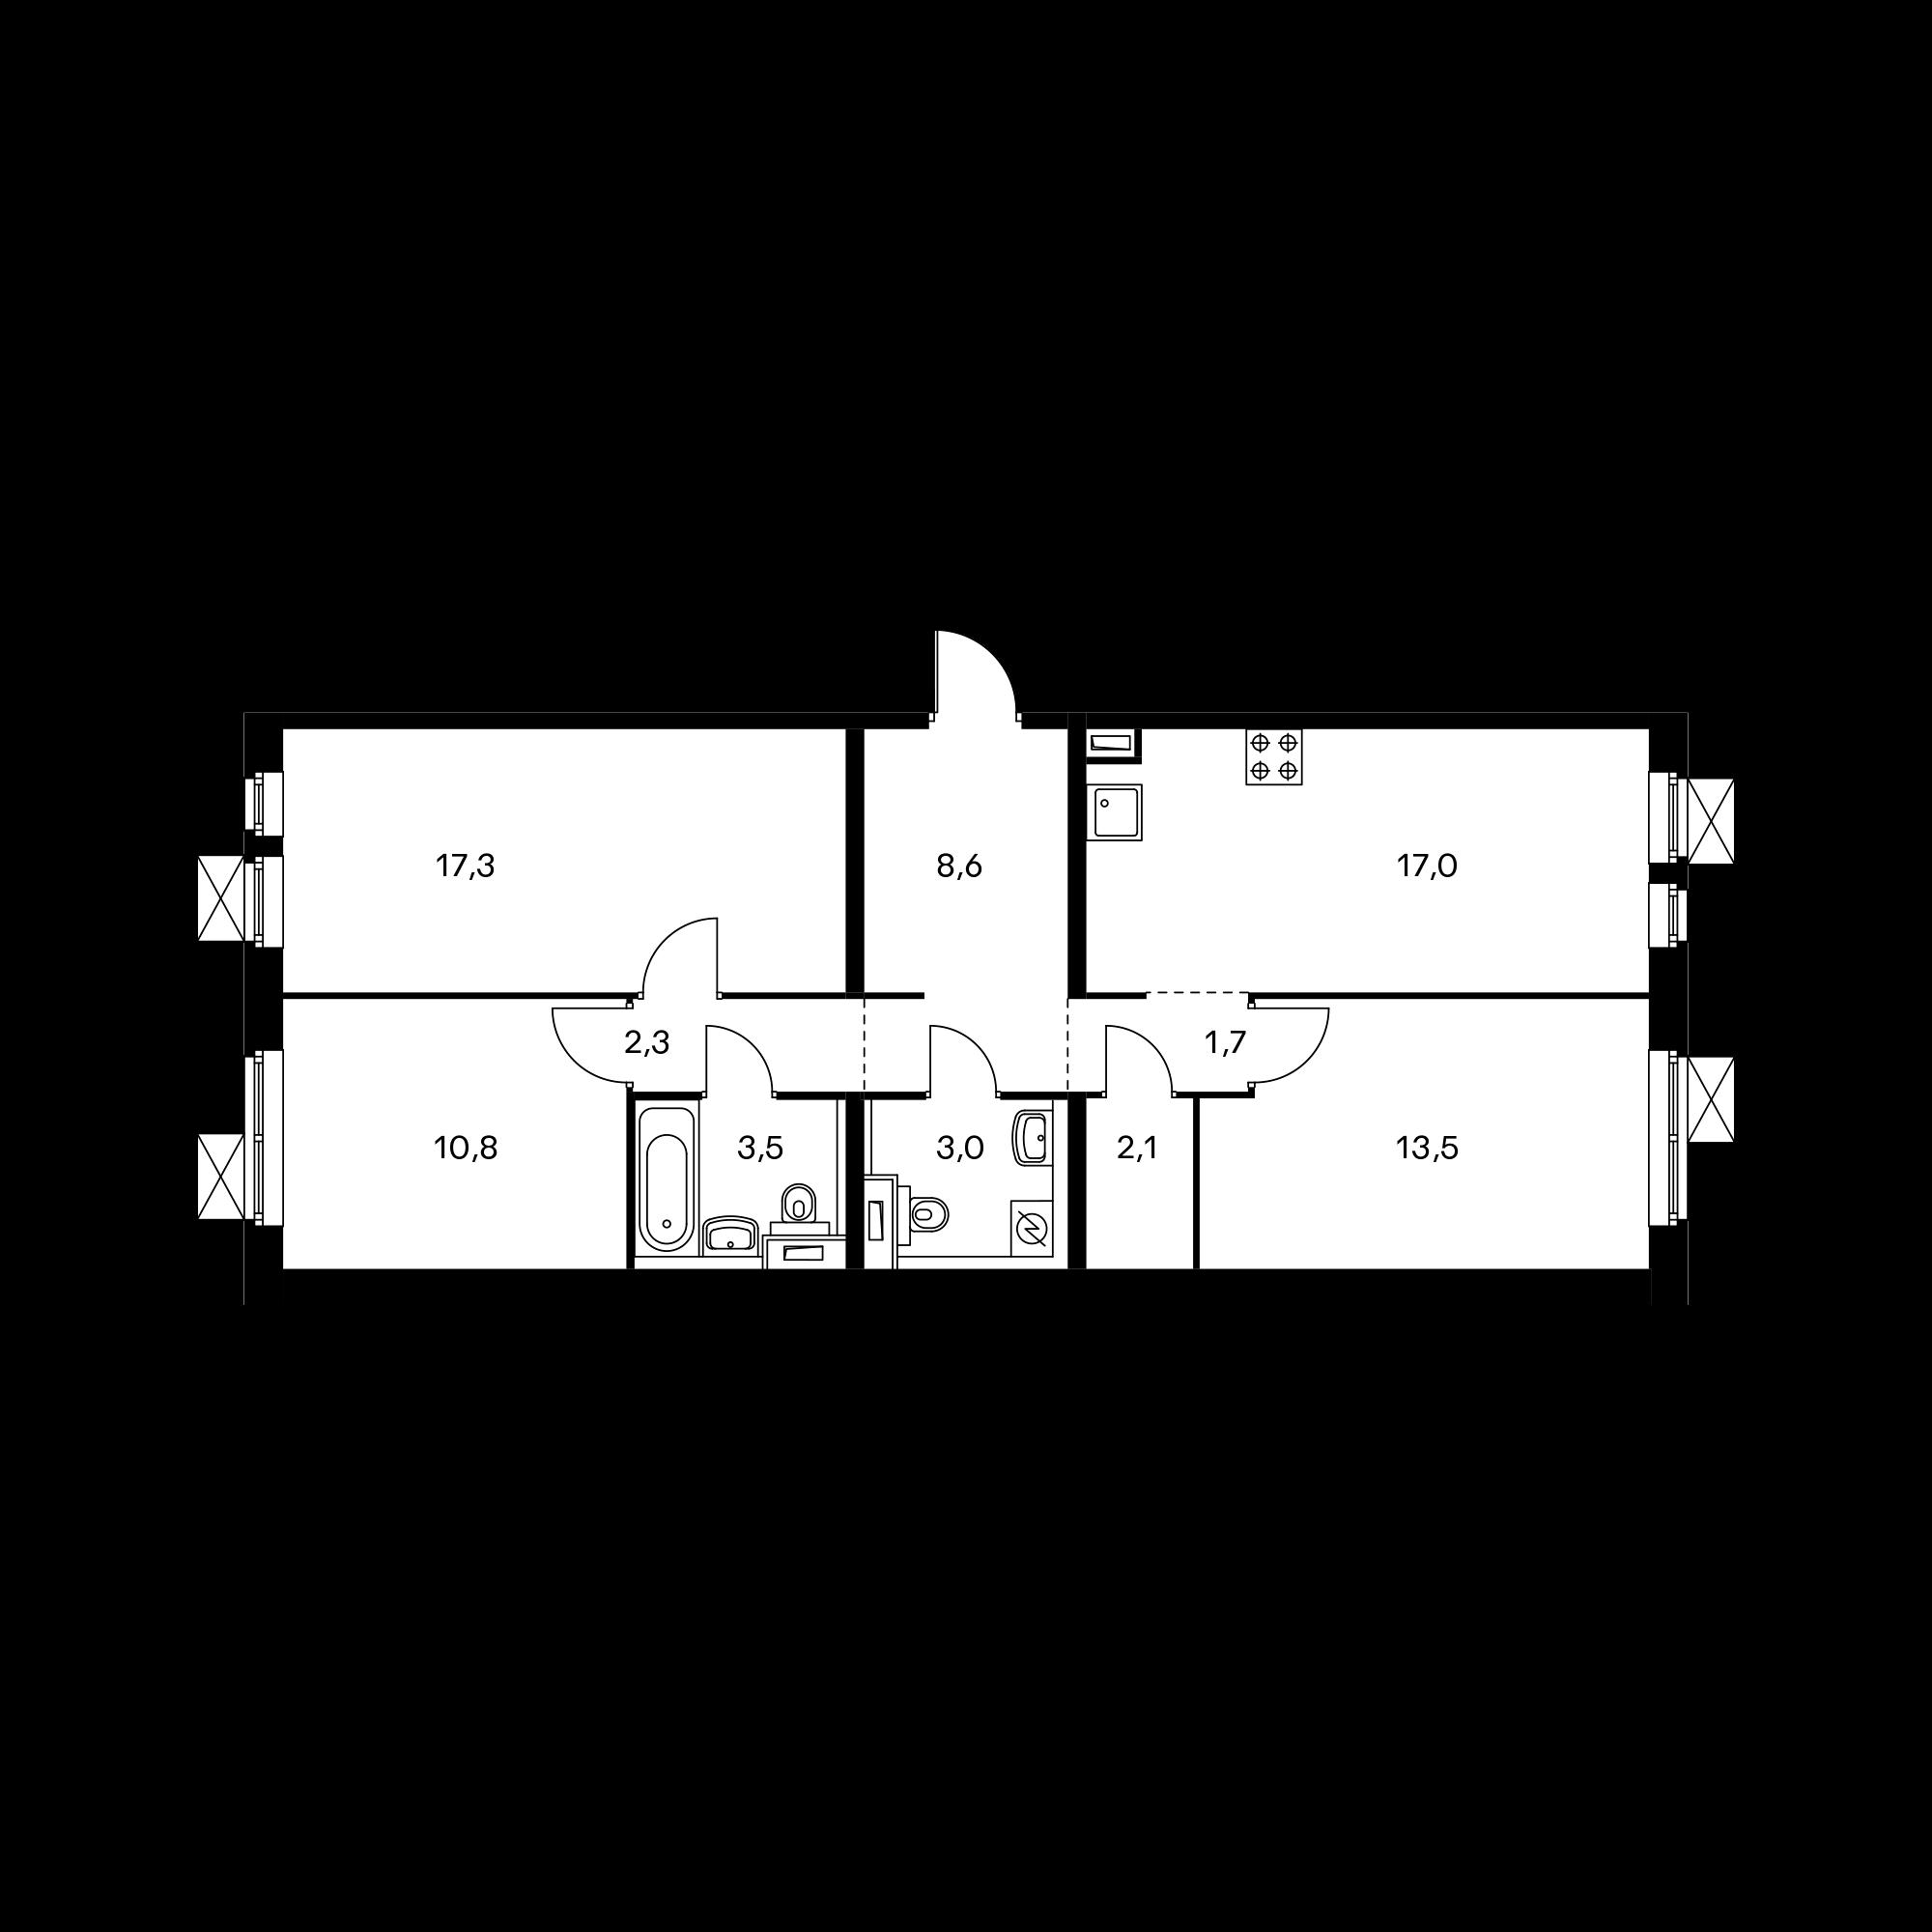 3KM16_6.0-1